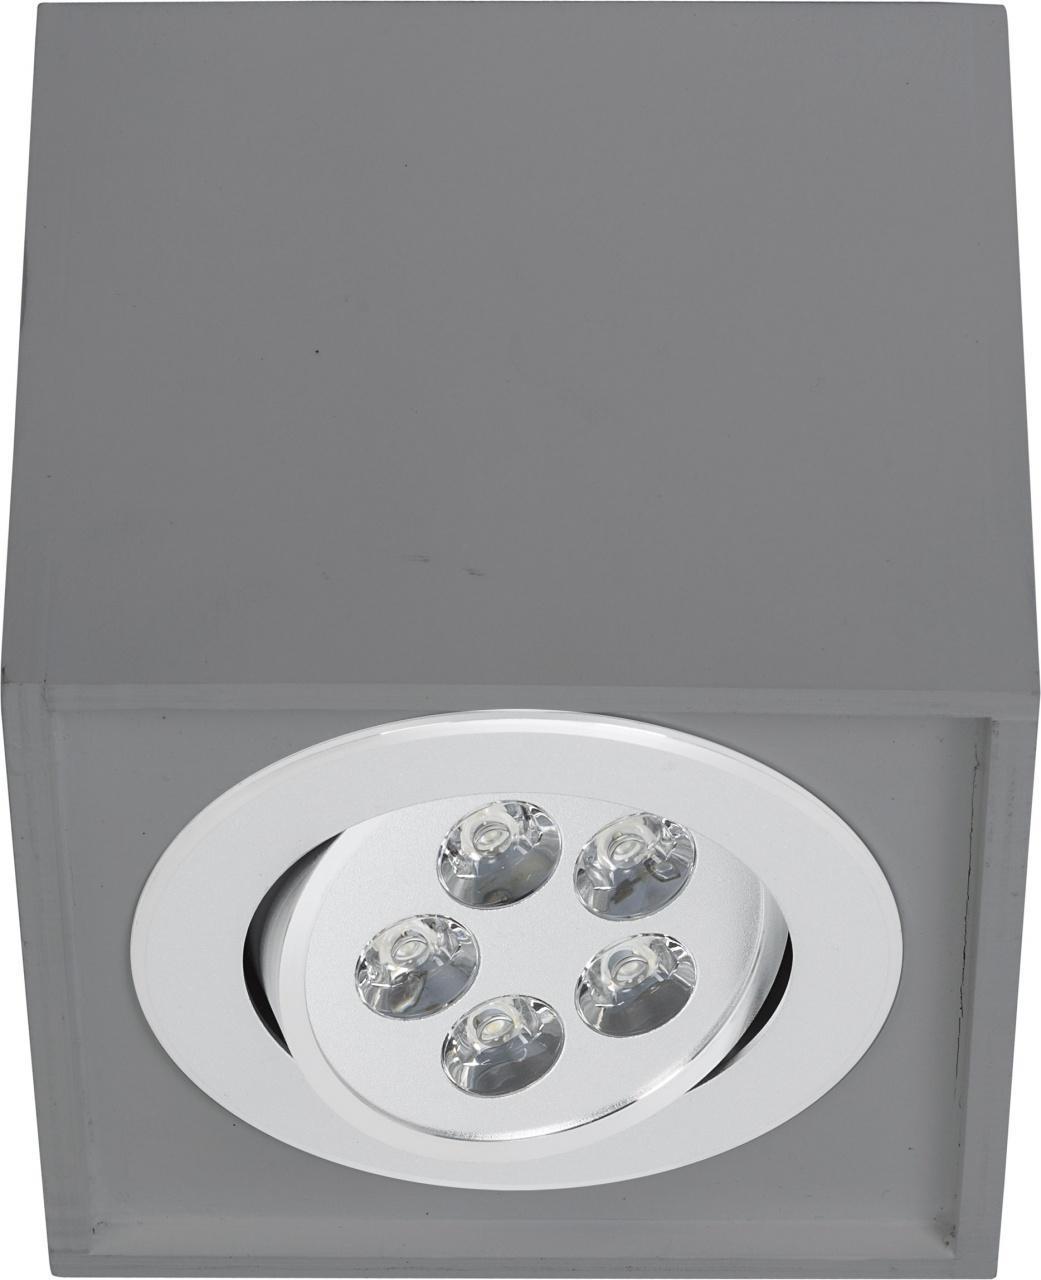 Потолочный светодиодный светильник Nowodvorski Box Led 9630 nowodvorski потолочный светильник nowodvorski straight led white seiling s 9620